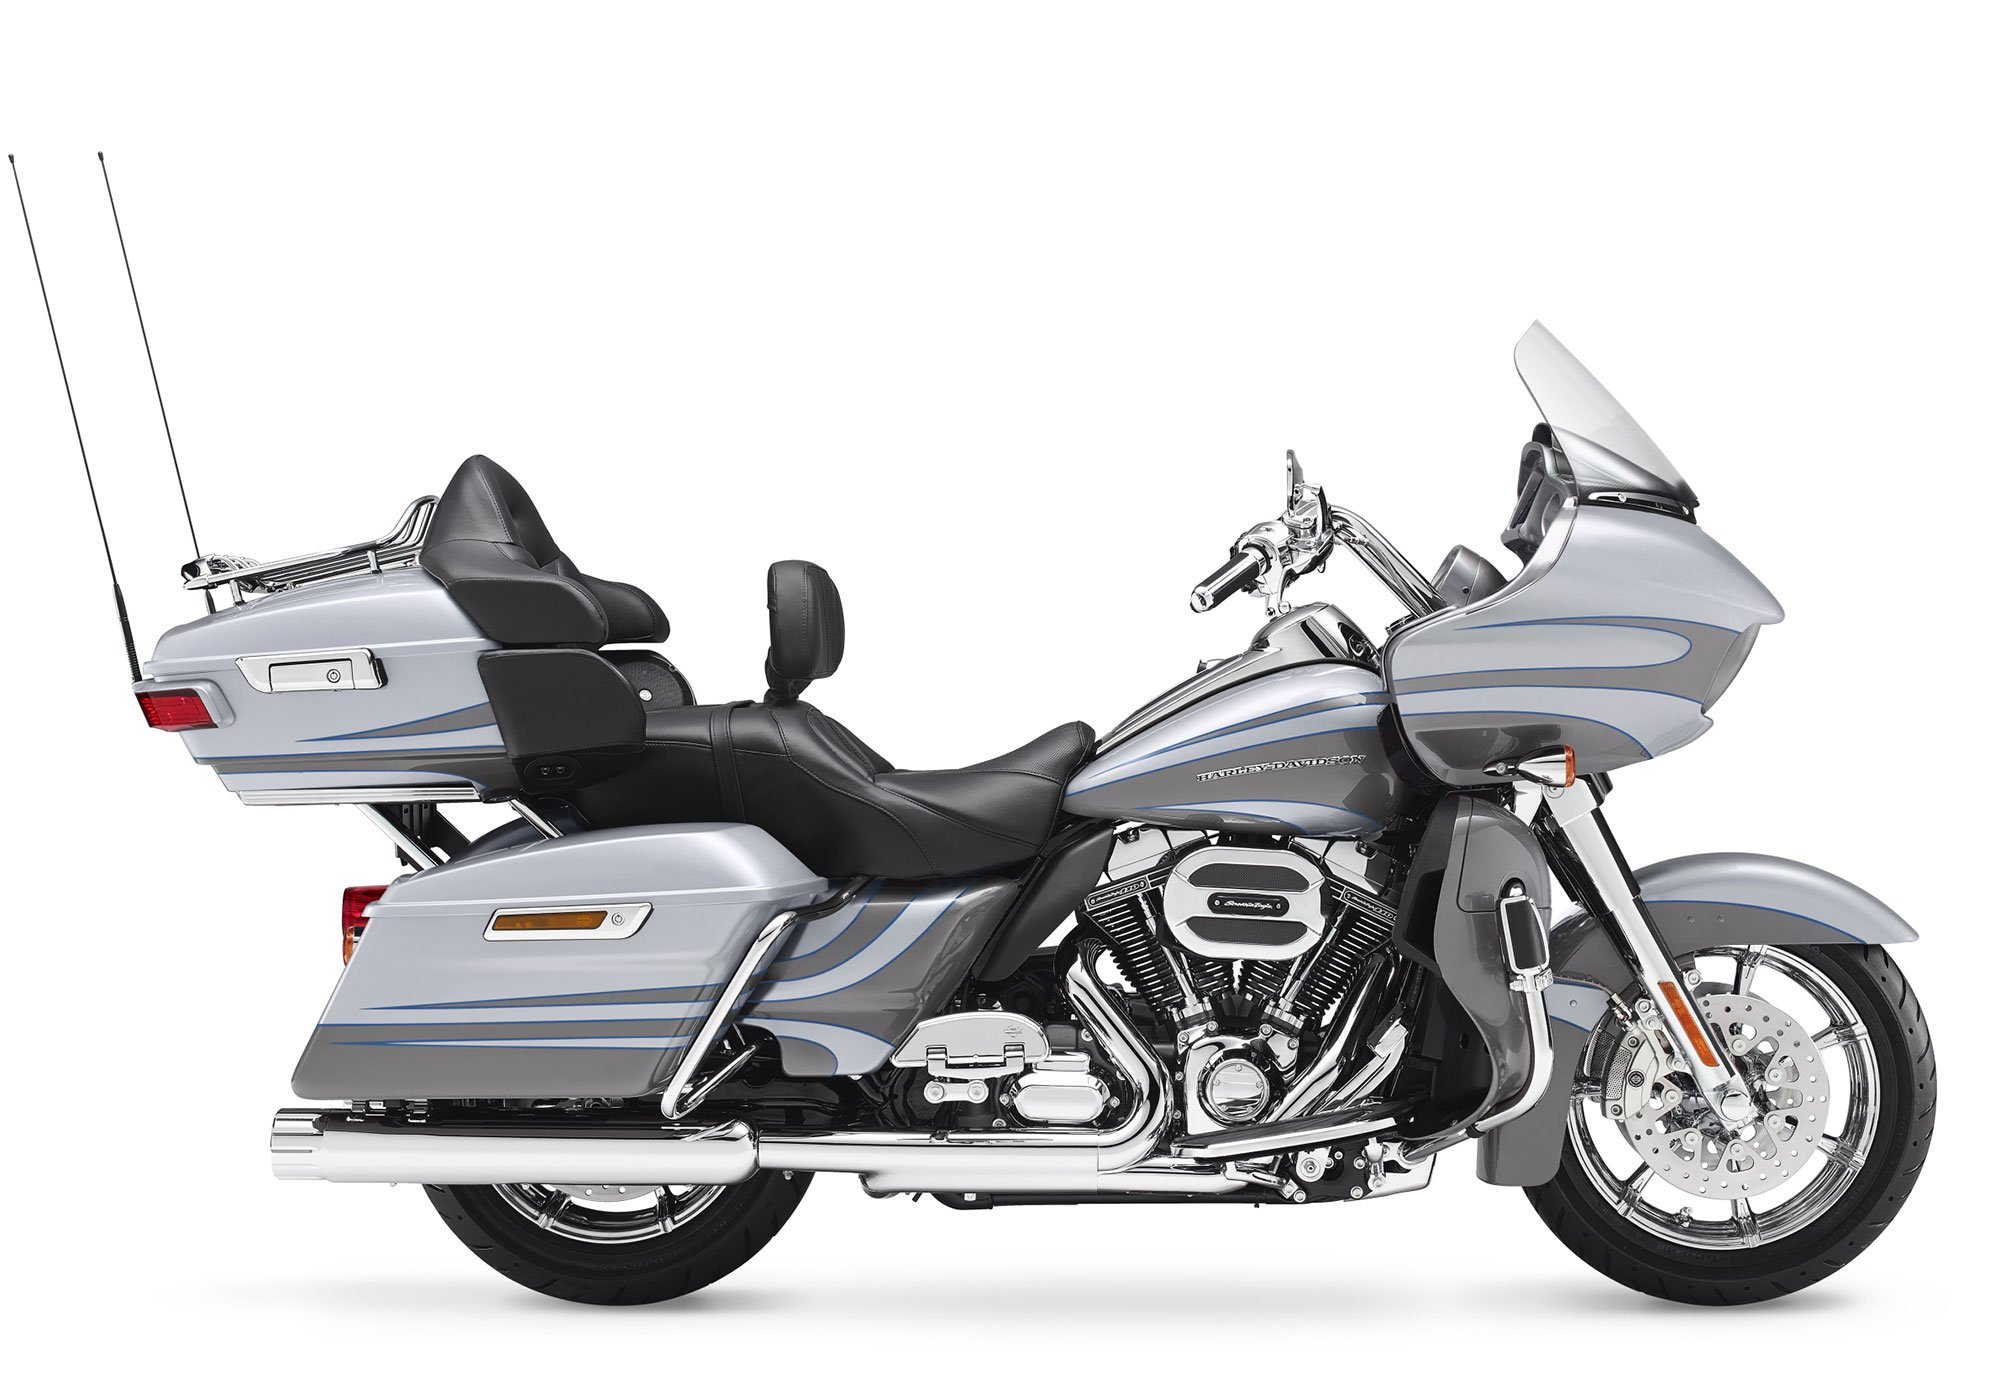 2016 Harley Davidson CVO Road Glide Ultra Motorbike Bike